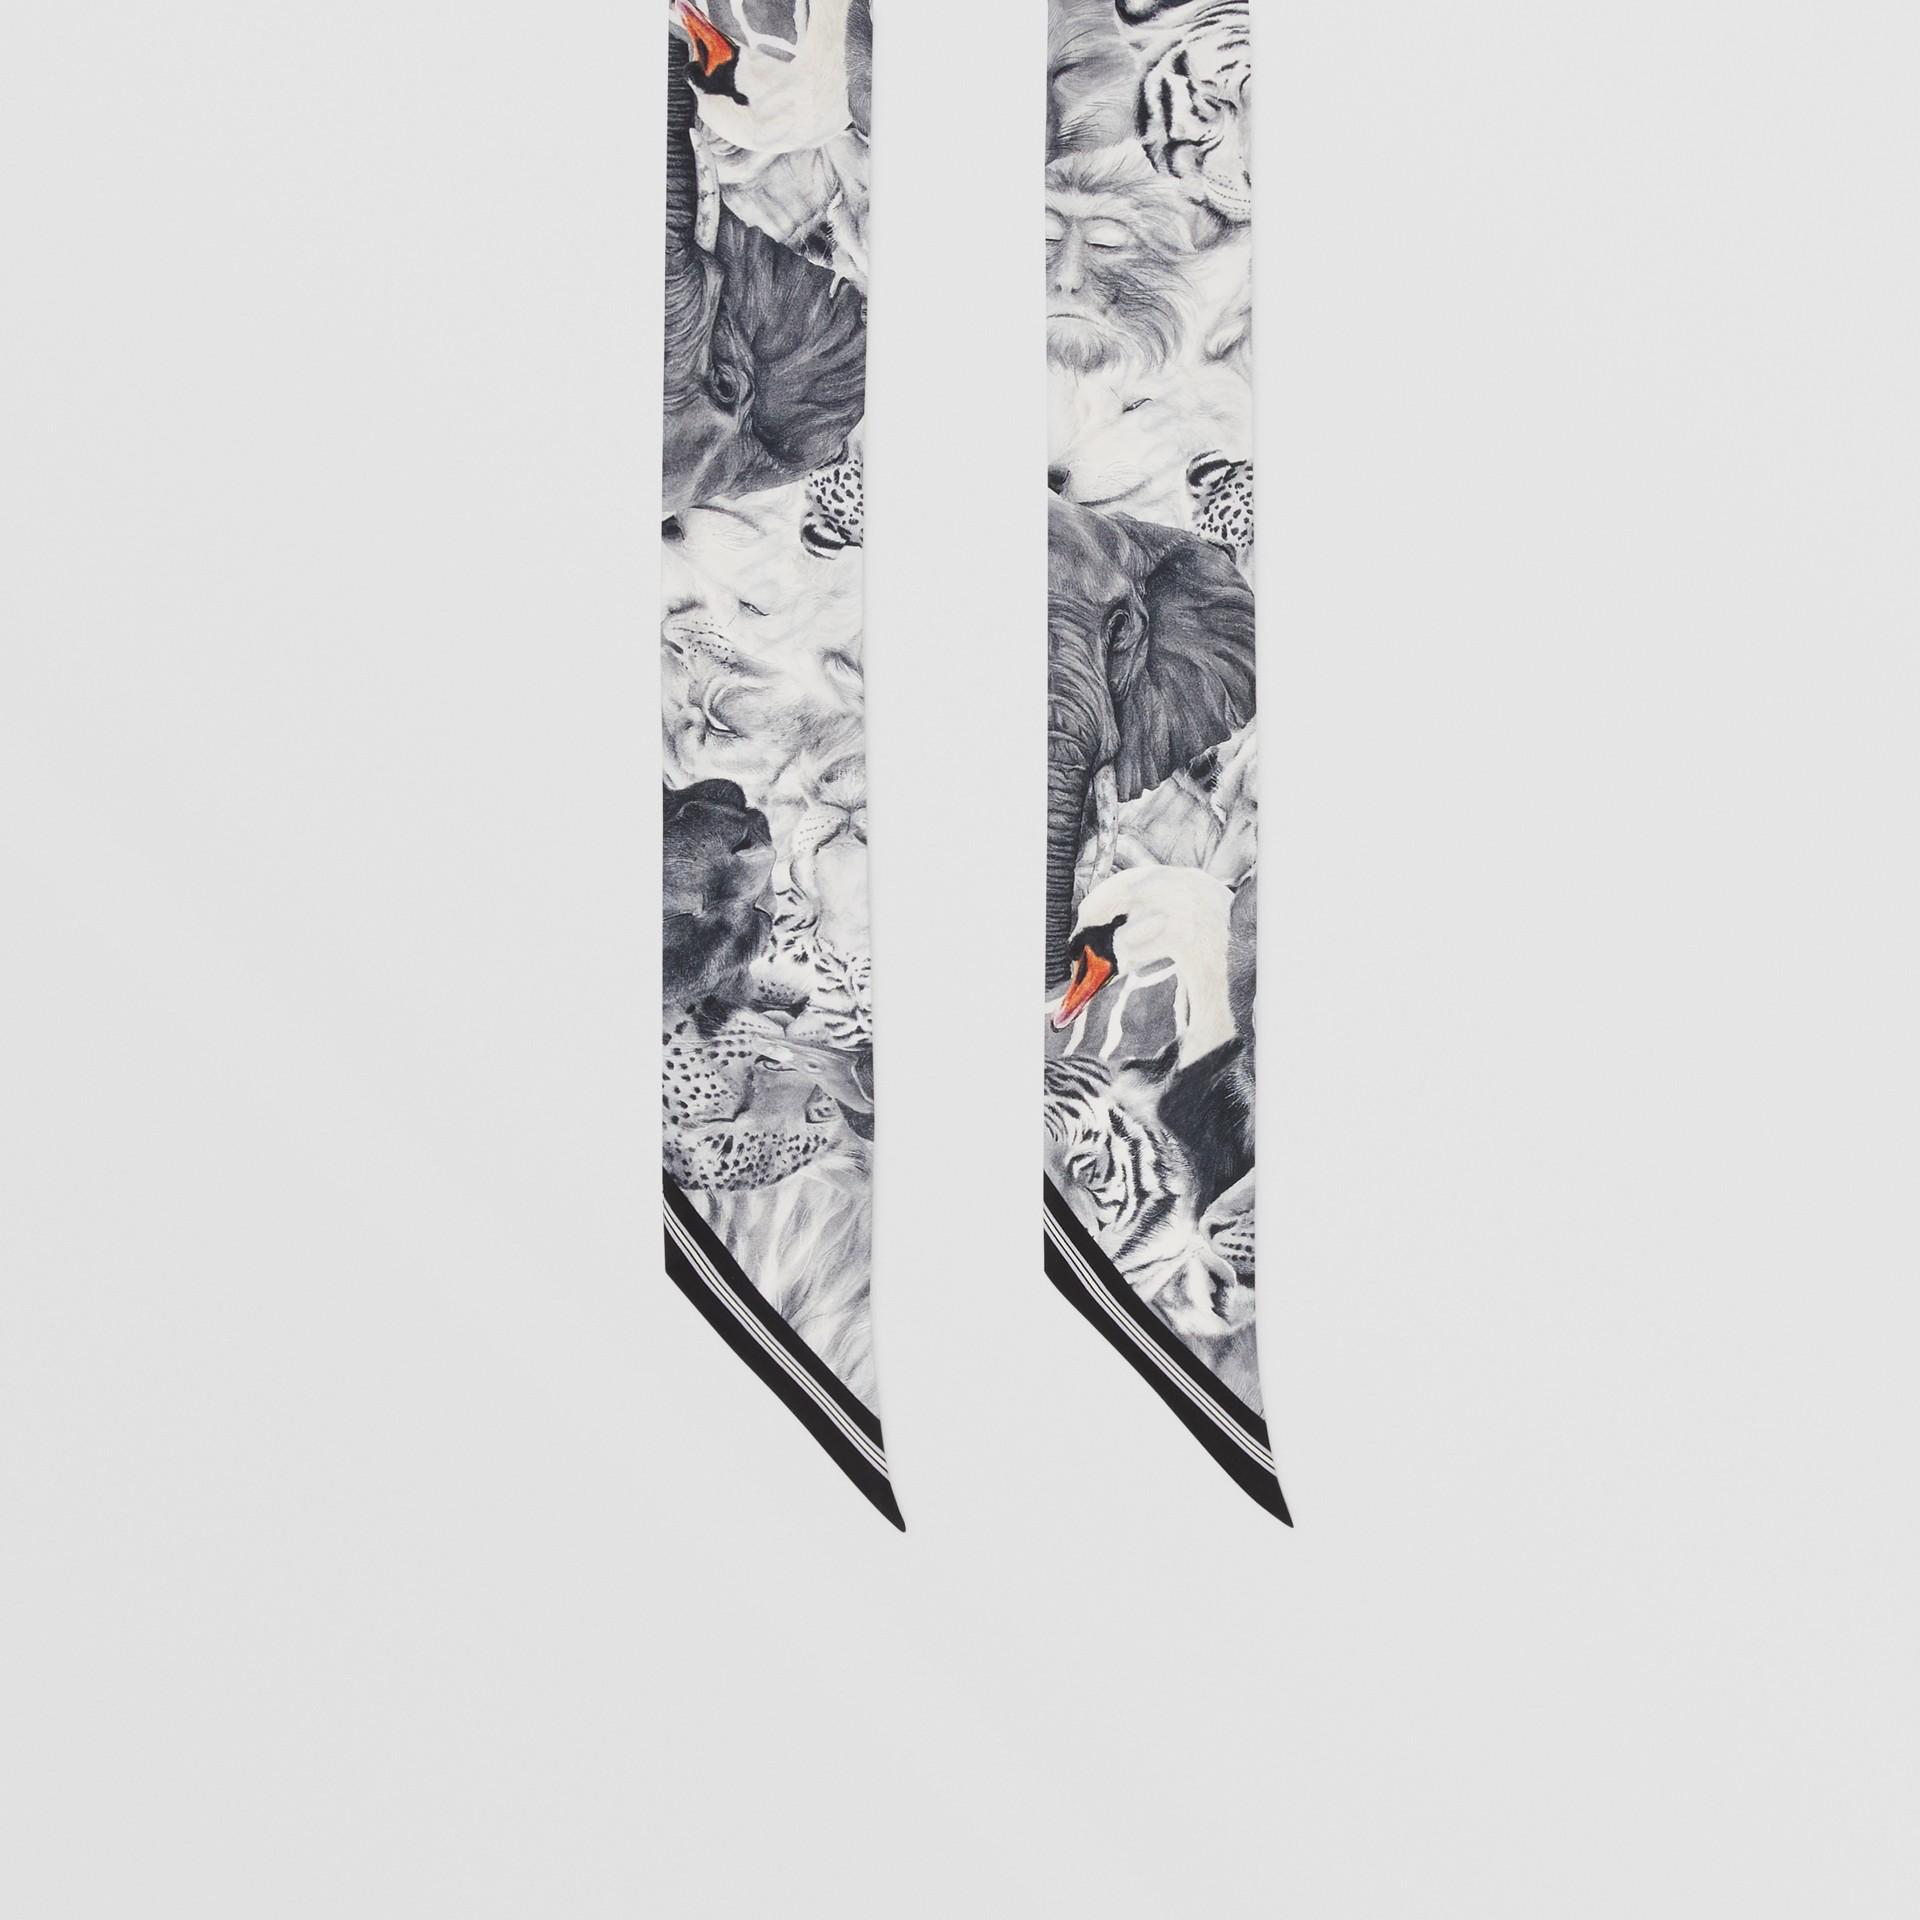 Animalia and Logo Print Silk Skinny Scarf in Vanilla | Burberry United States - gallery image 4